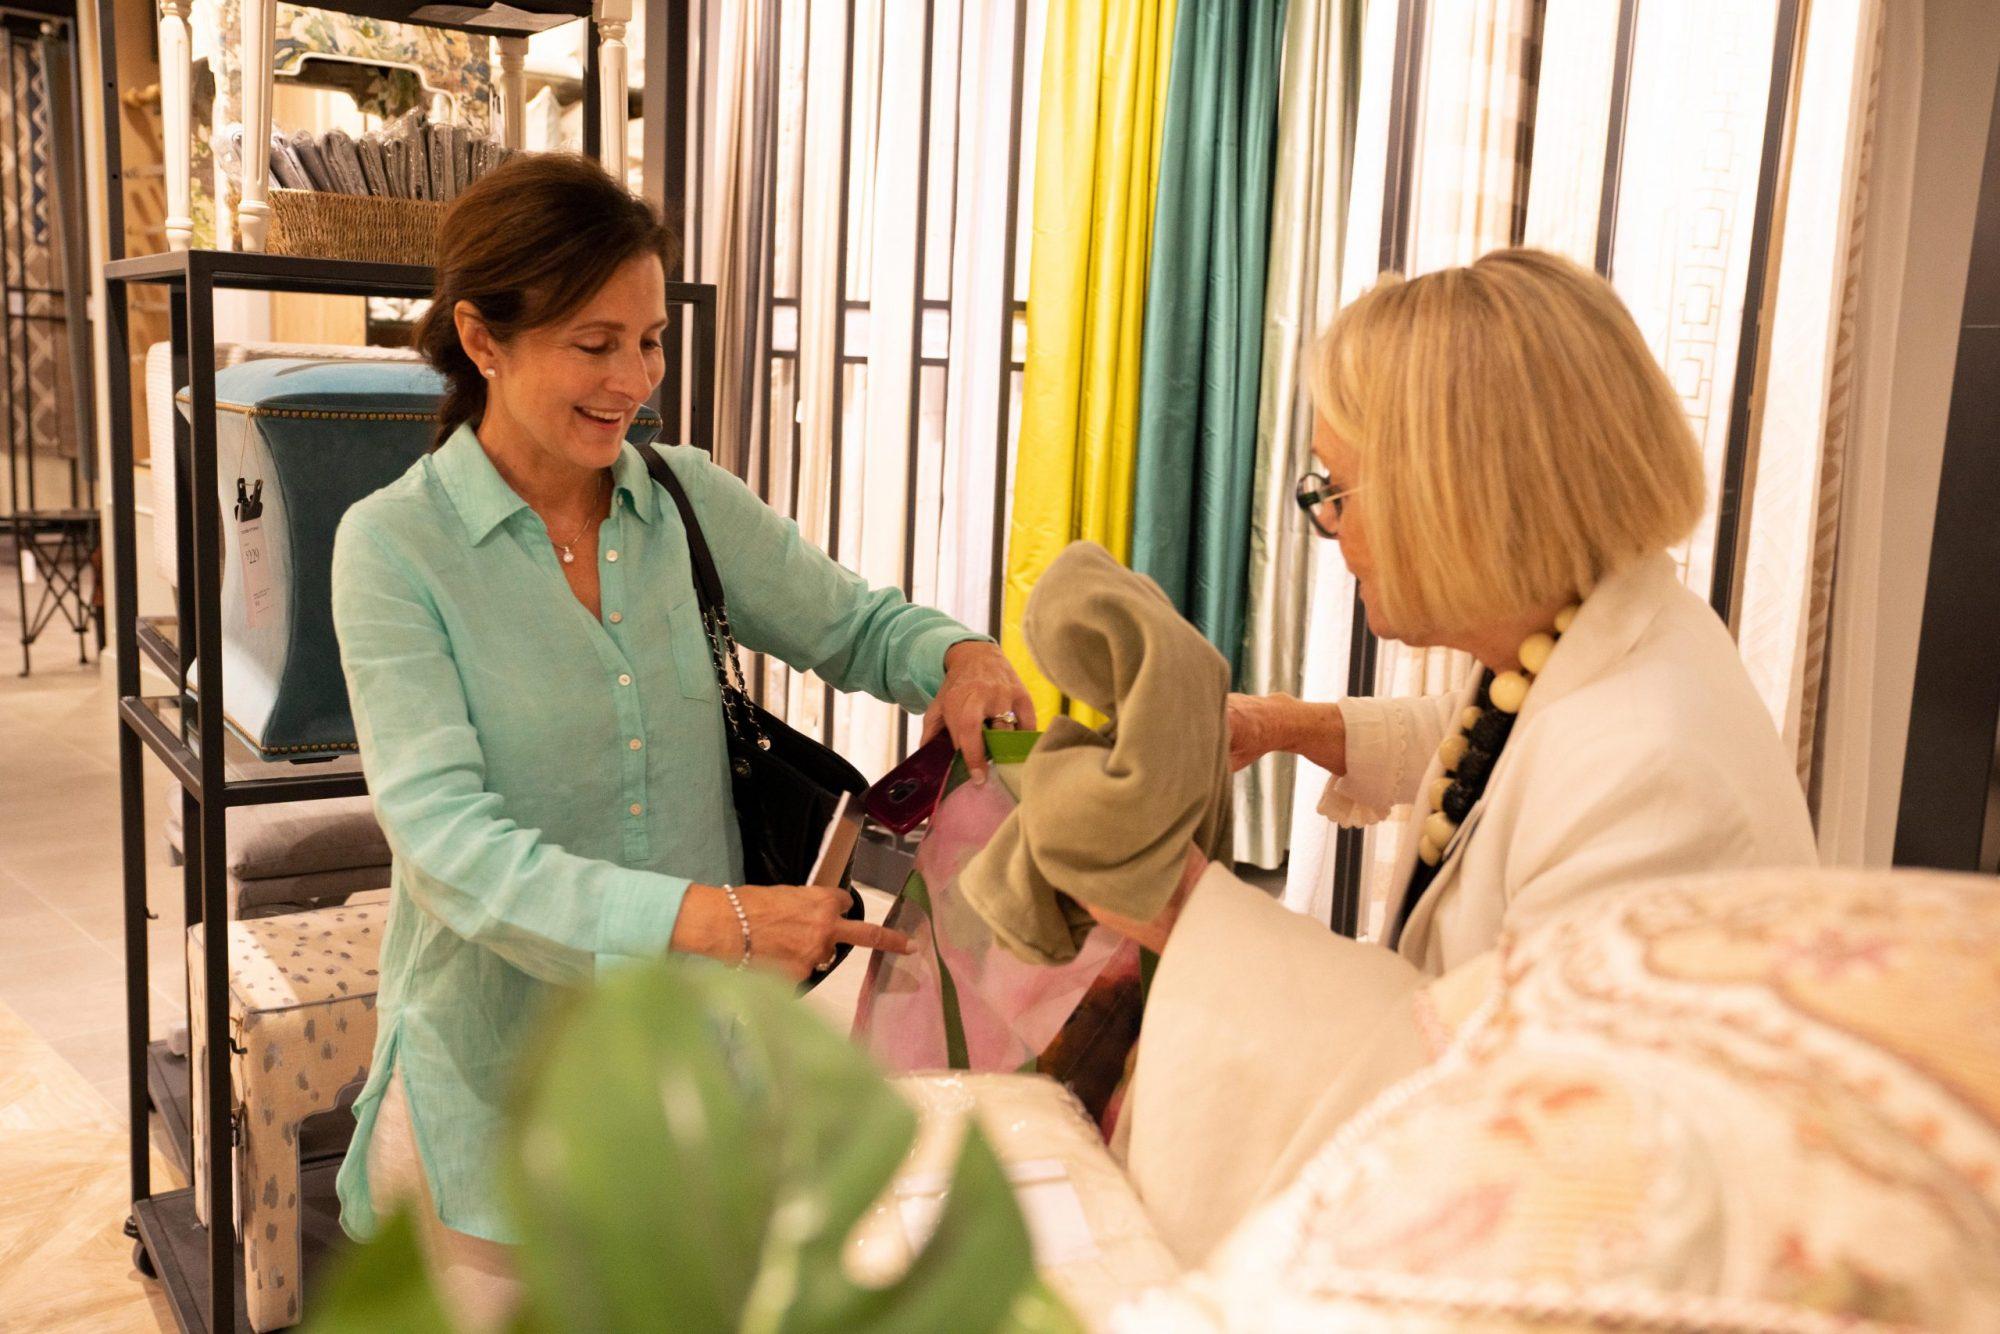 Ballard Designs Retail Team Member with Customer